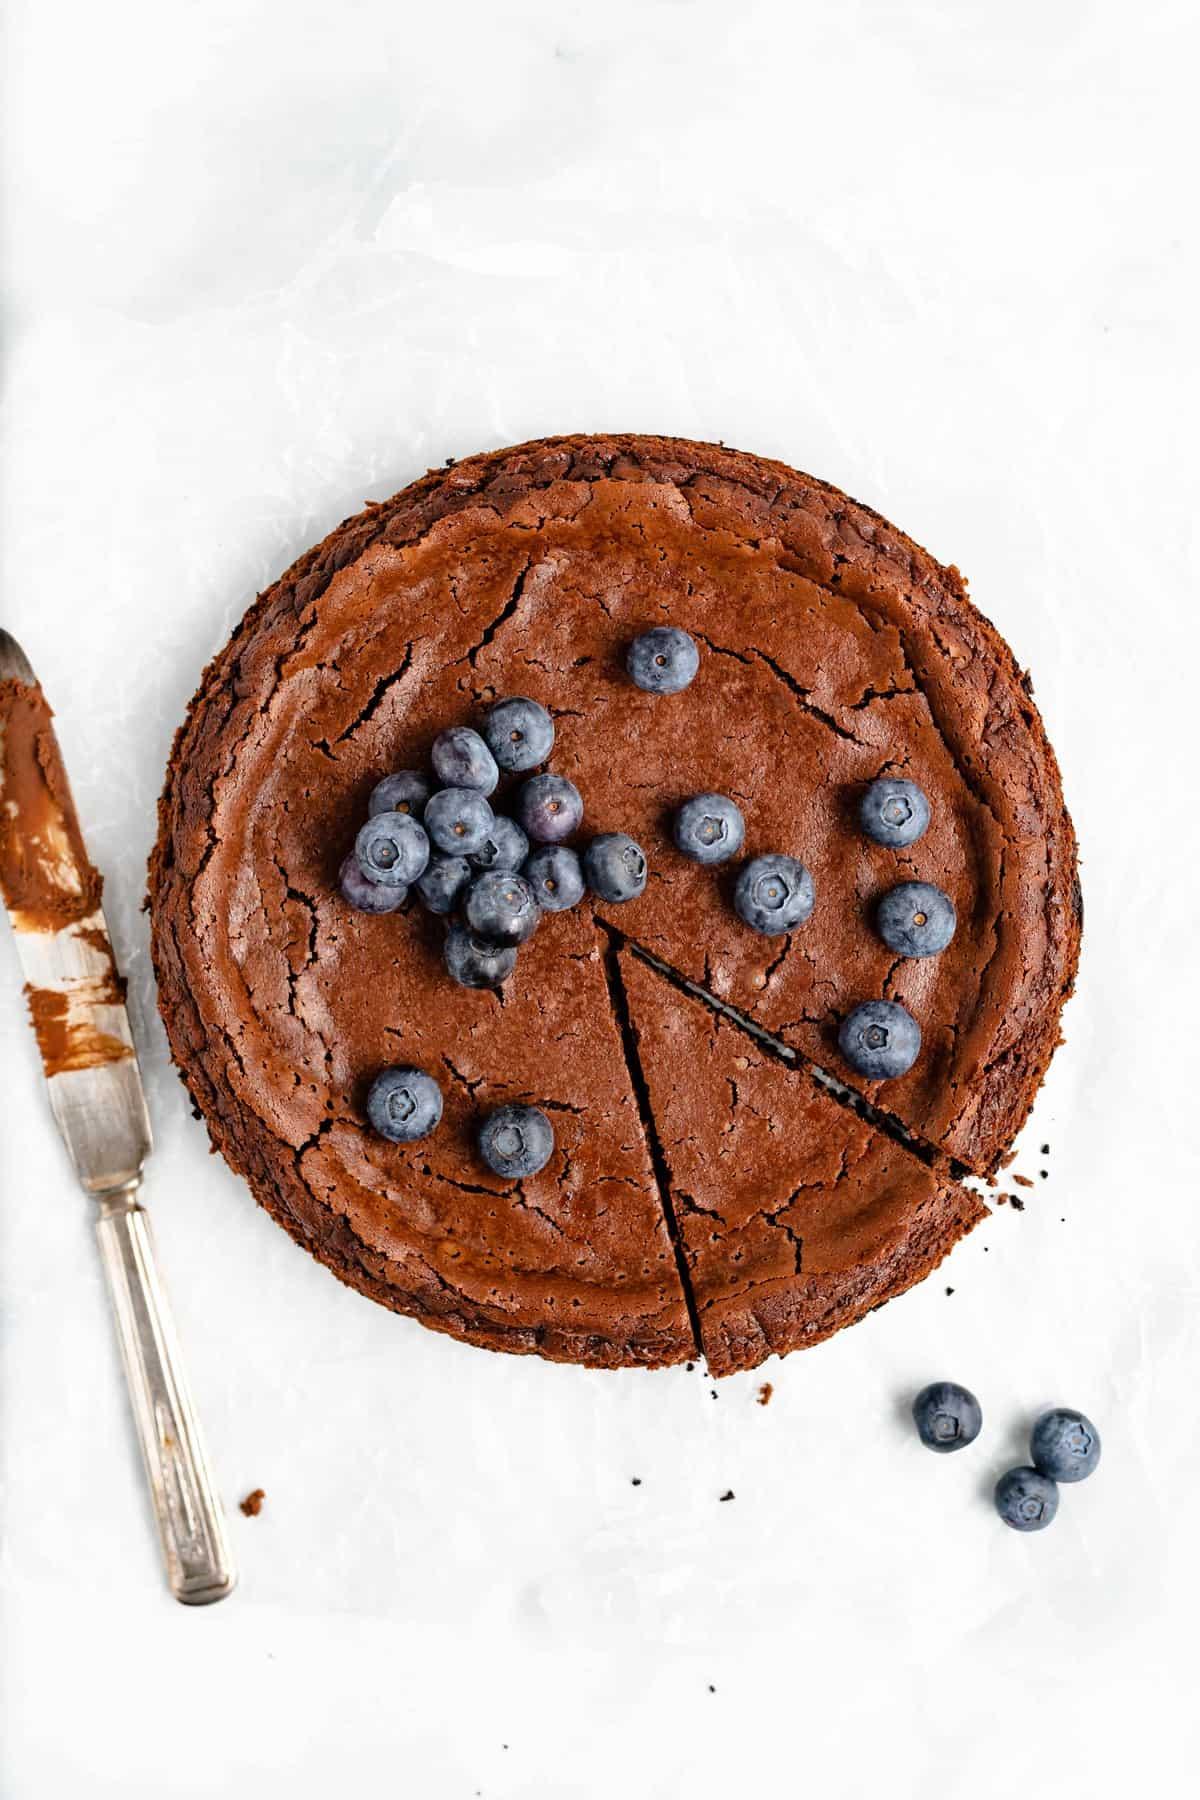 Easy no-fuss chocolate cheesecake recipe.